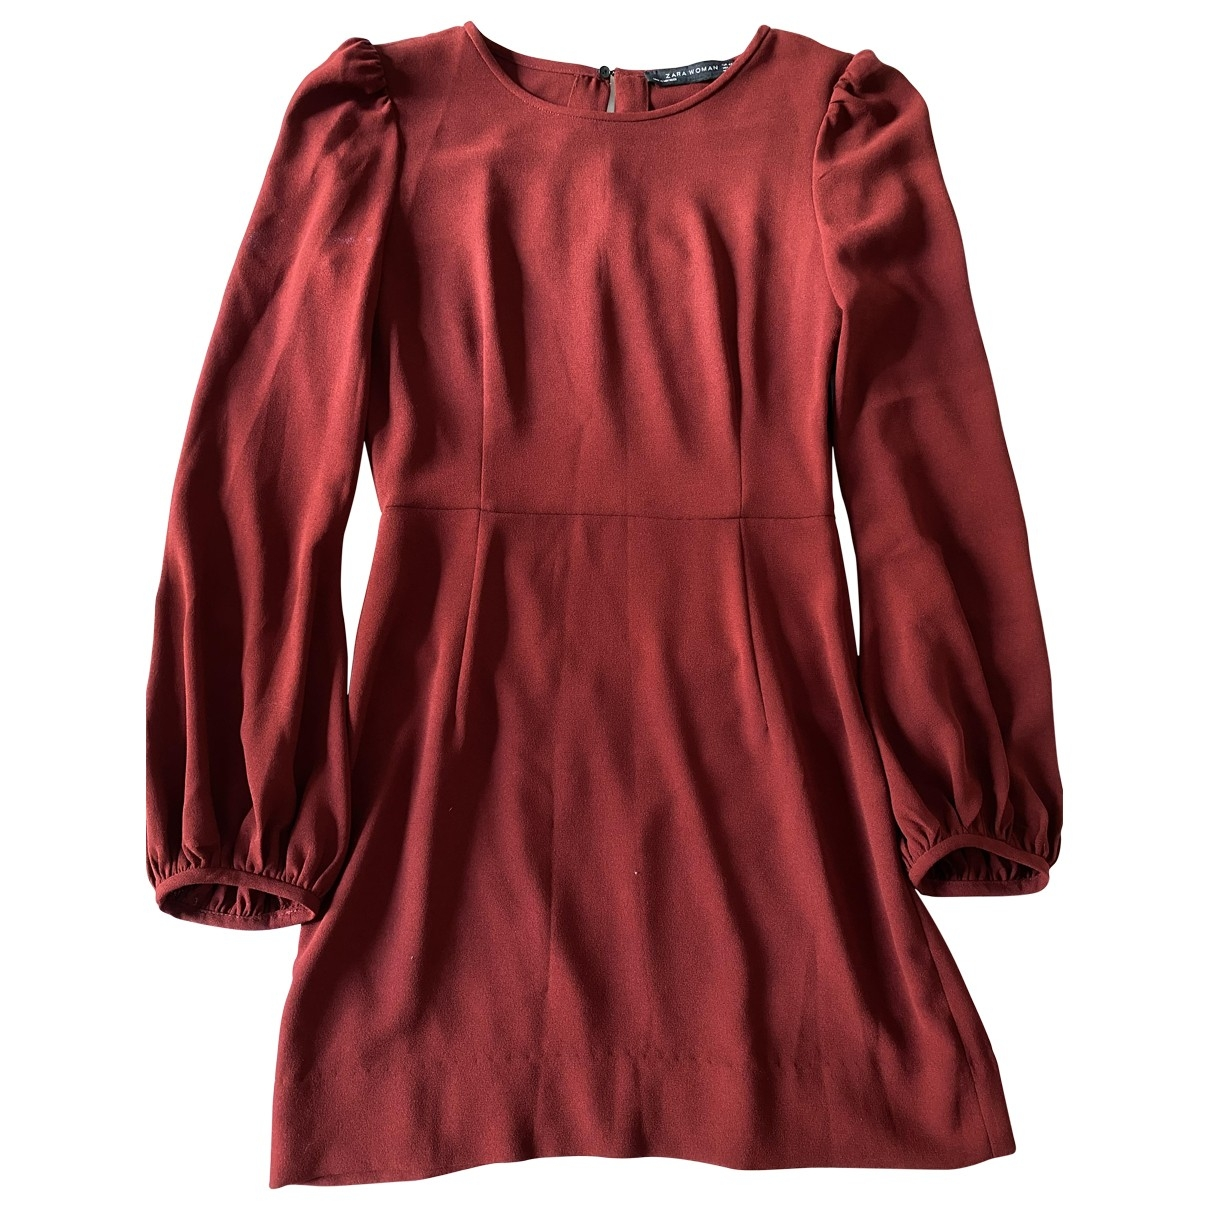 Zara \N Kleid in  Bordeauxrot Polyester